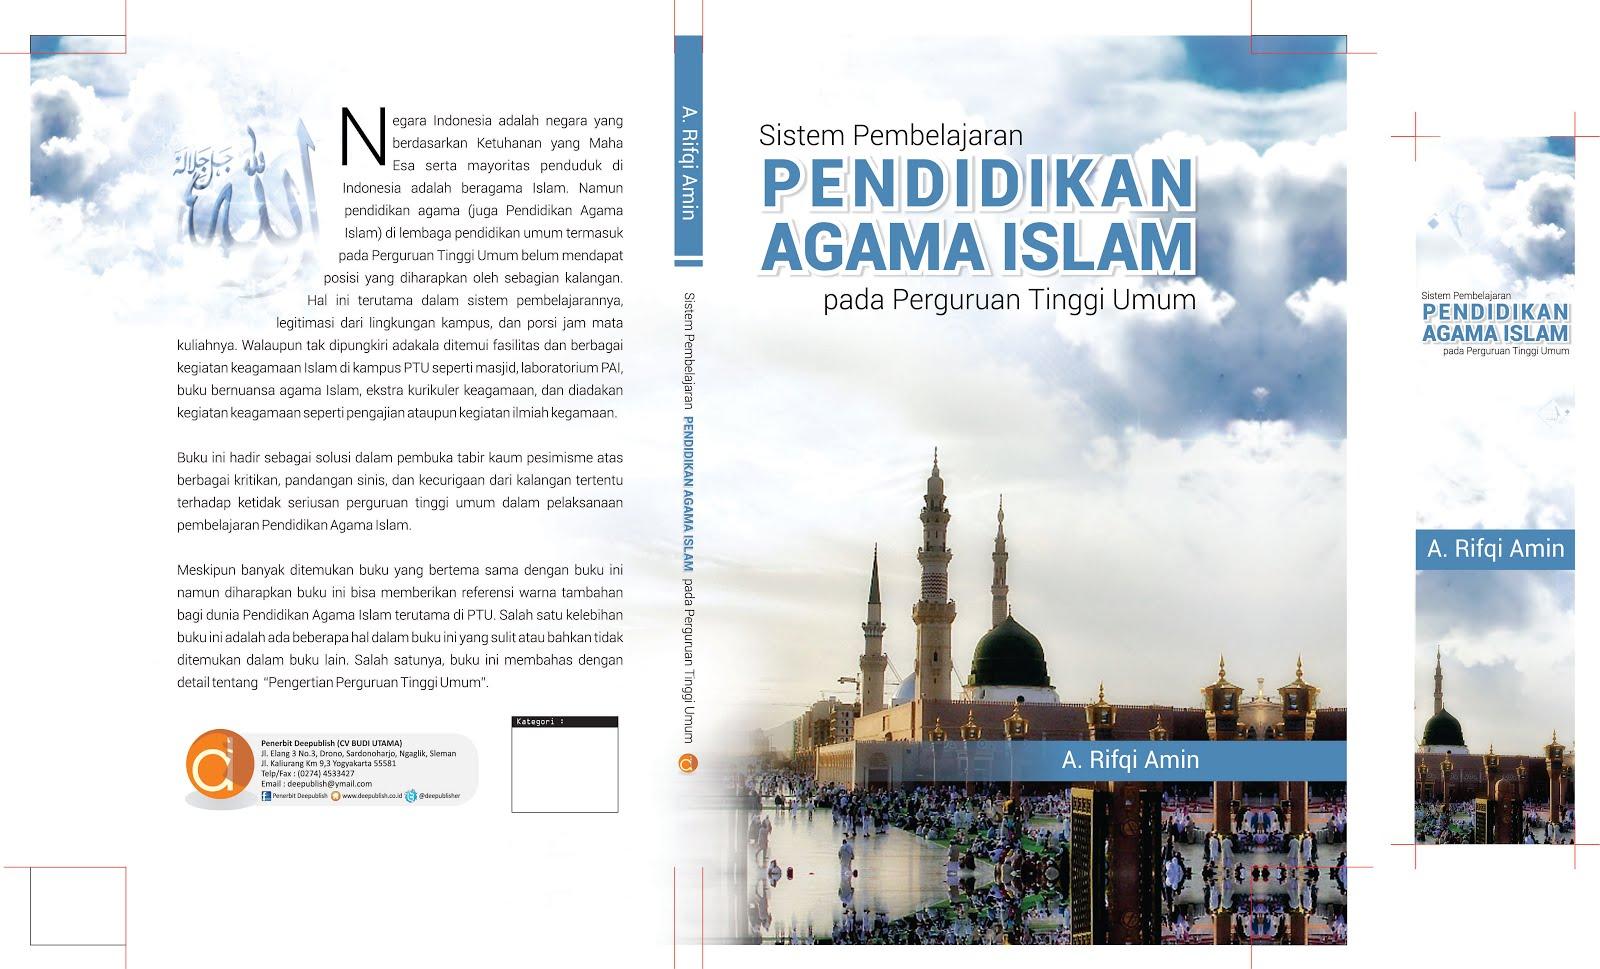 Sistem Pembelajaran Pendidikan Agama Islam pada Perguruan Tinggi Umum